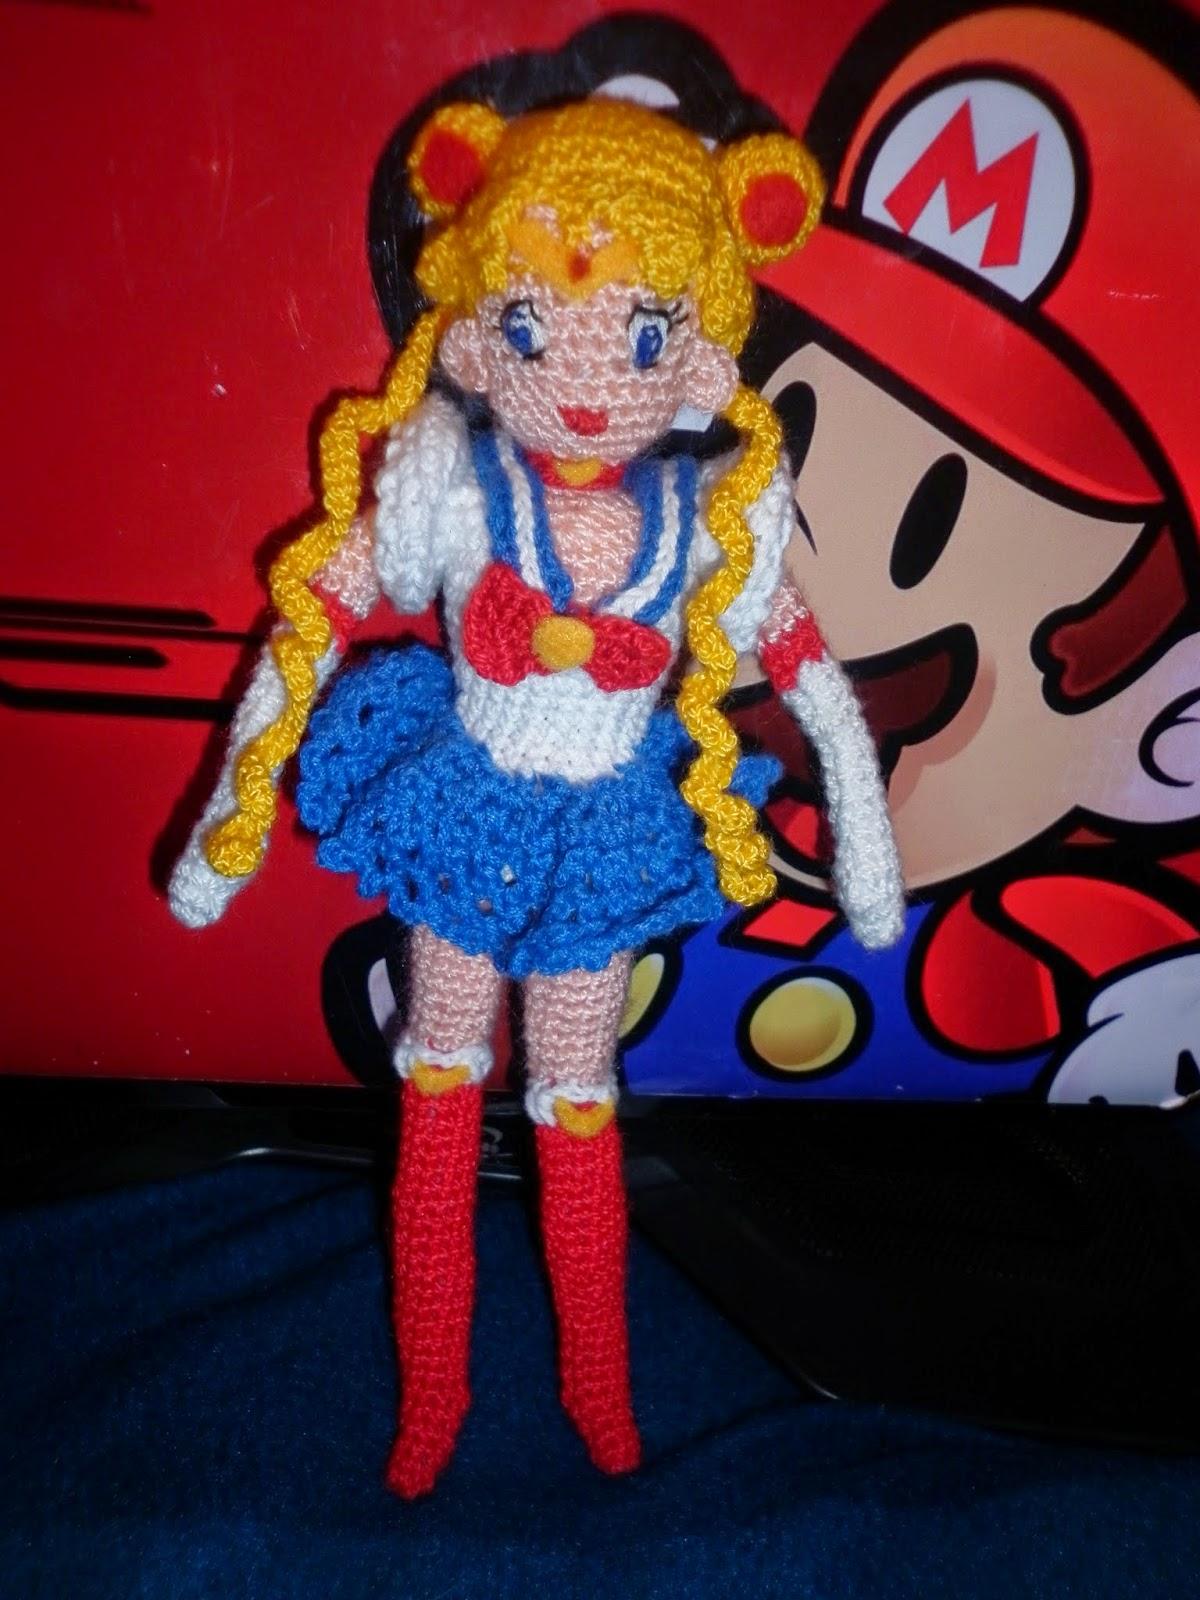 Amigurumi Anleitung Sailor Moon : Amigurumis kawai: Sailor Moon Amigurumi